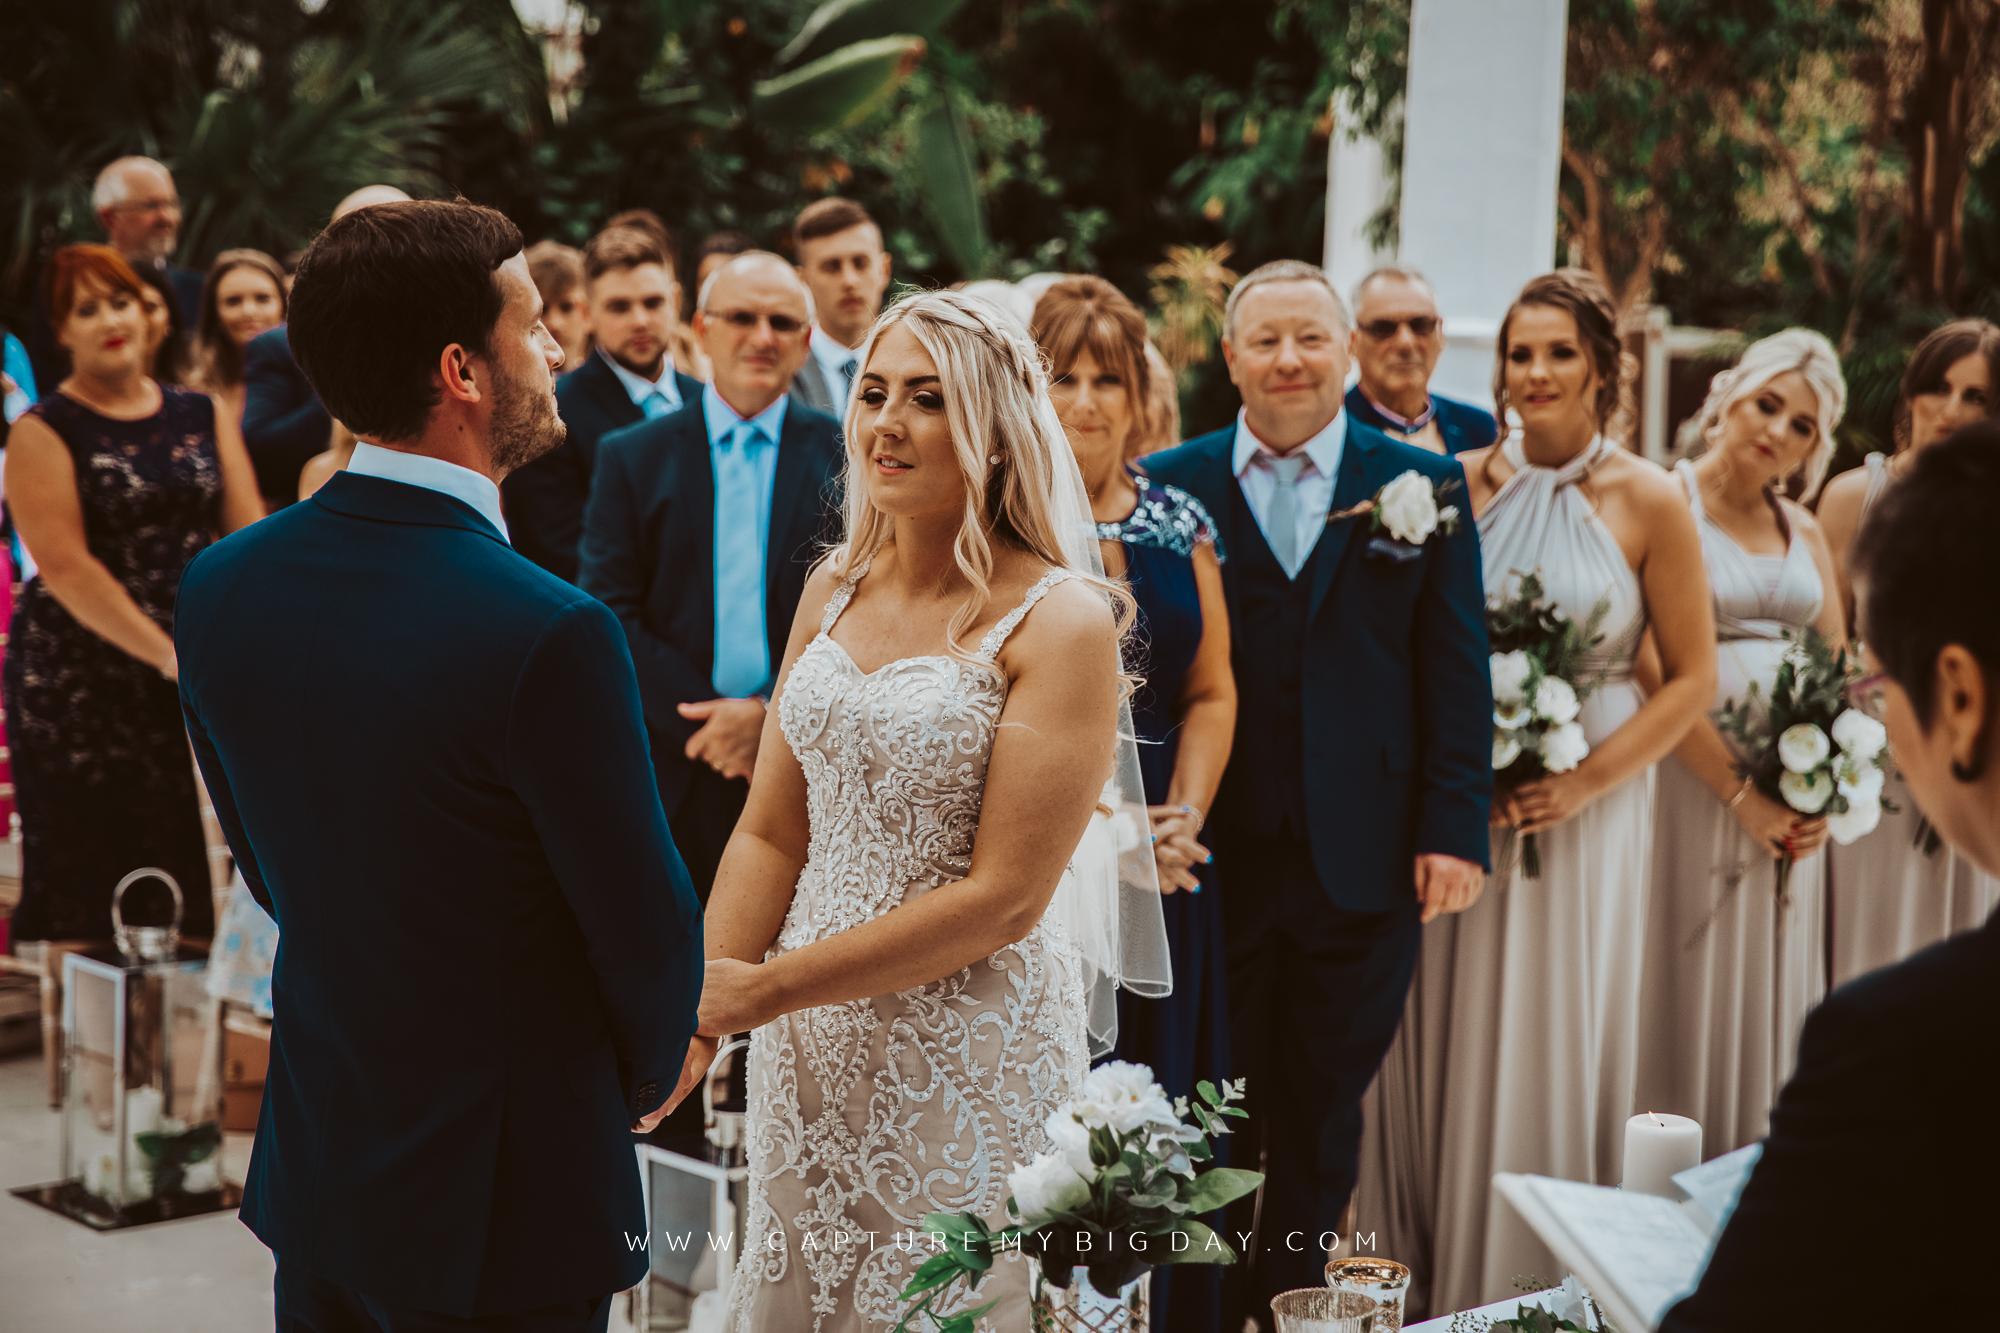 wedding vows at Sefton park